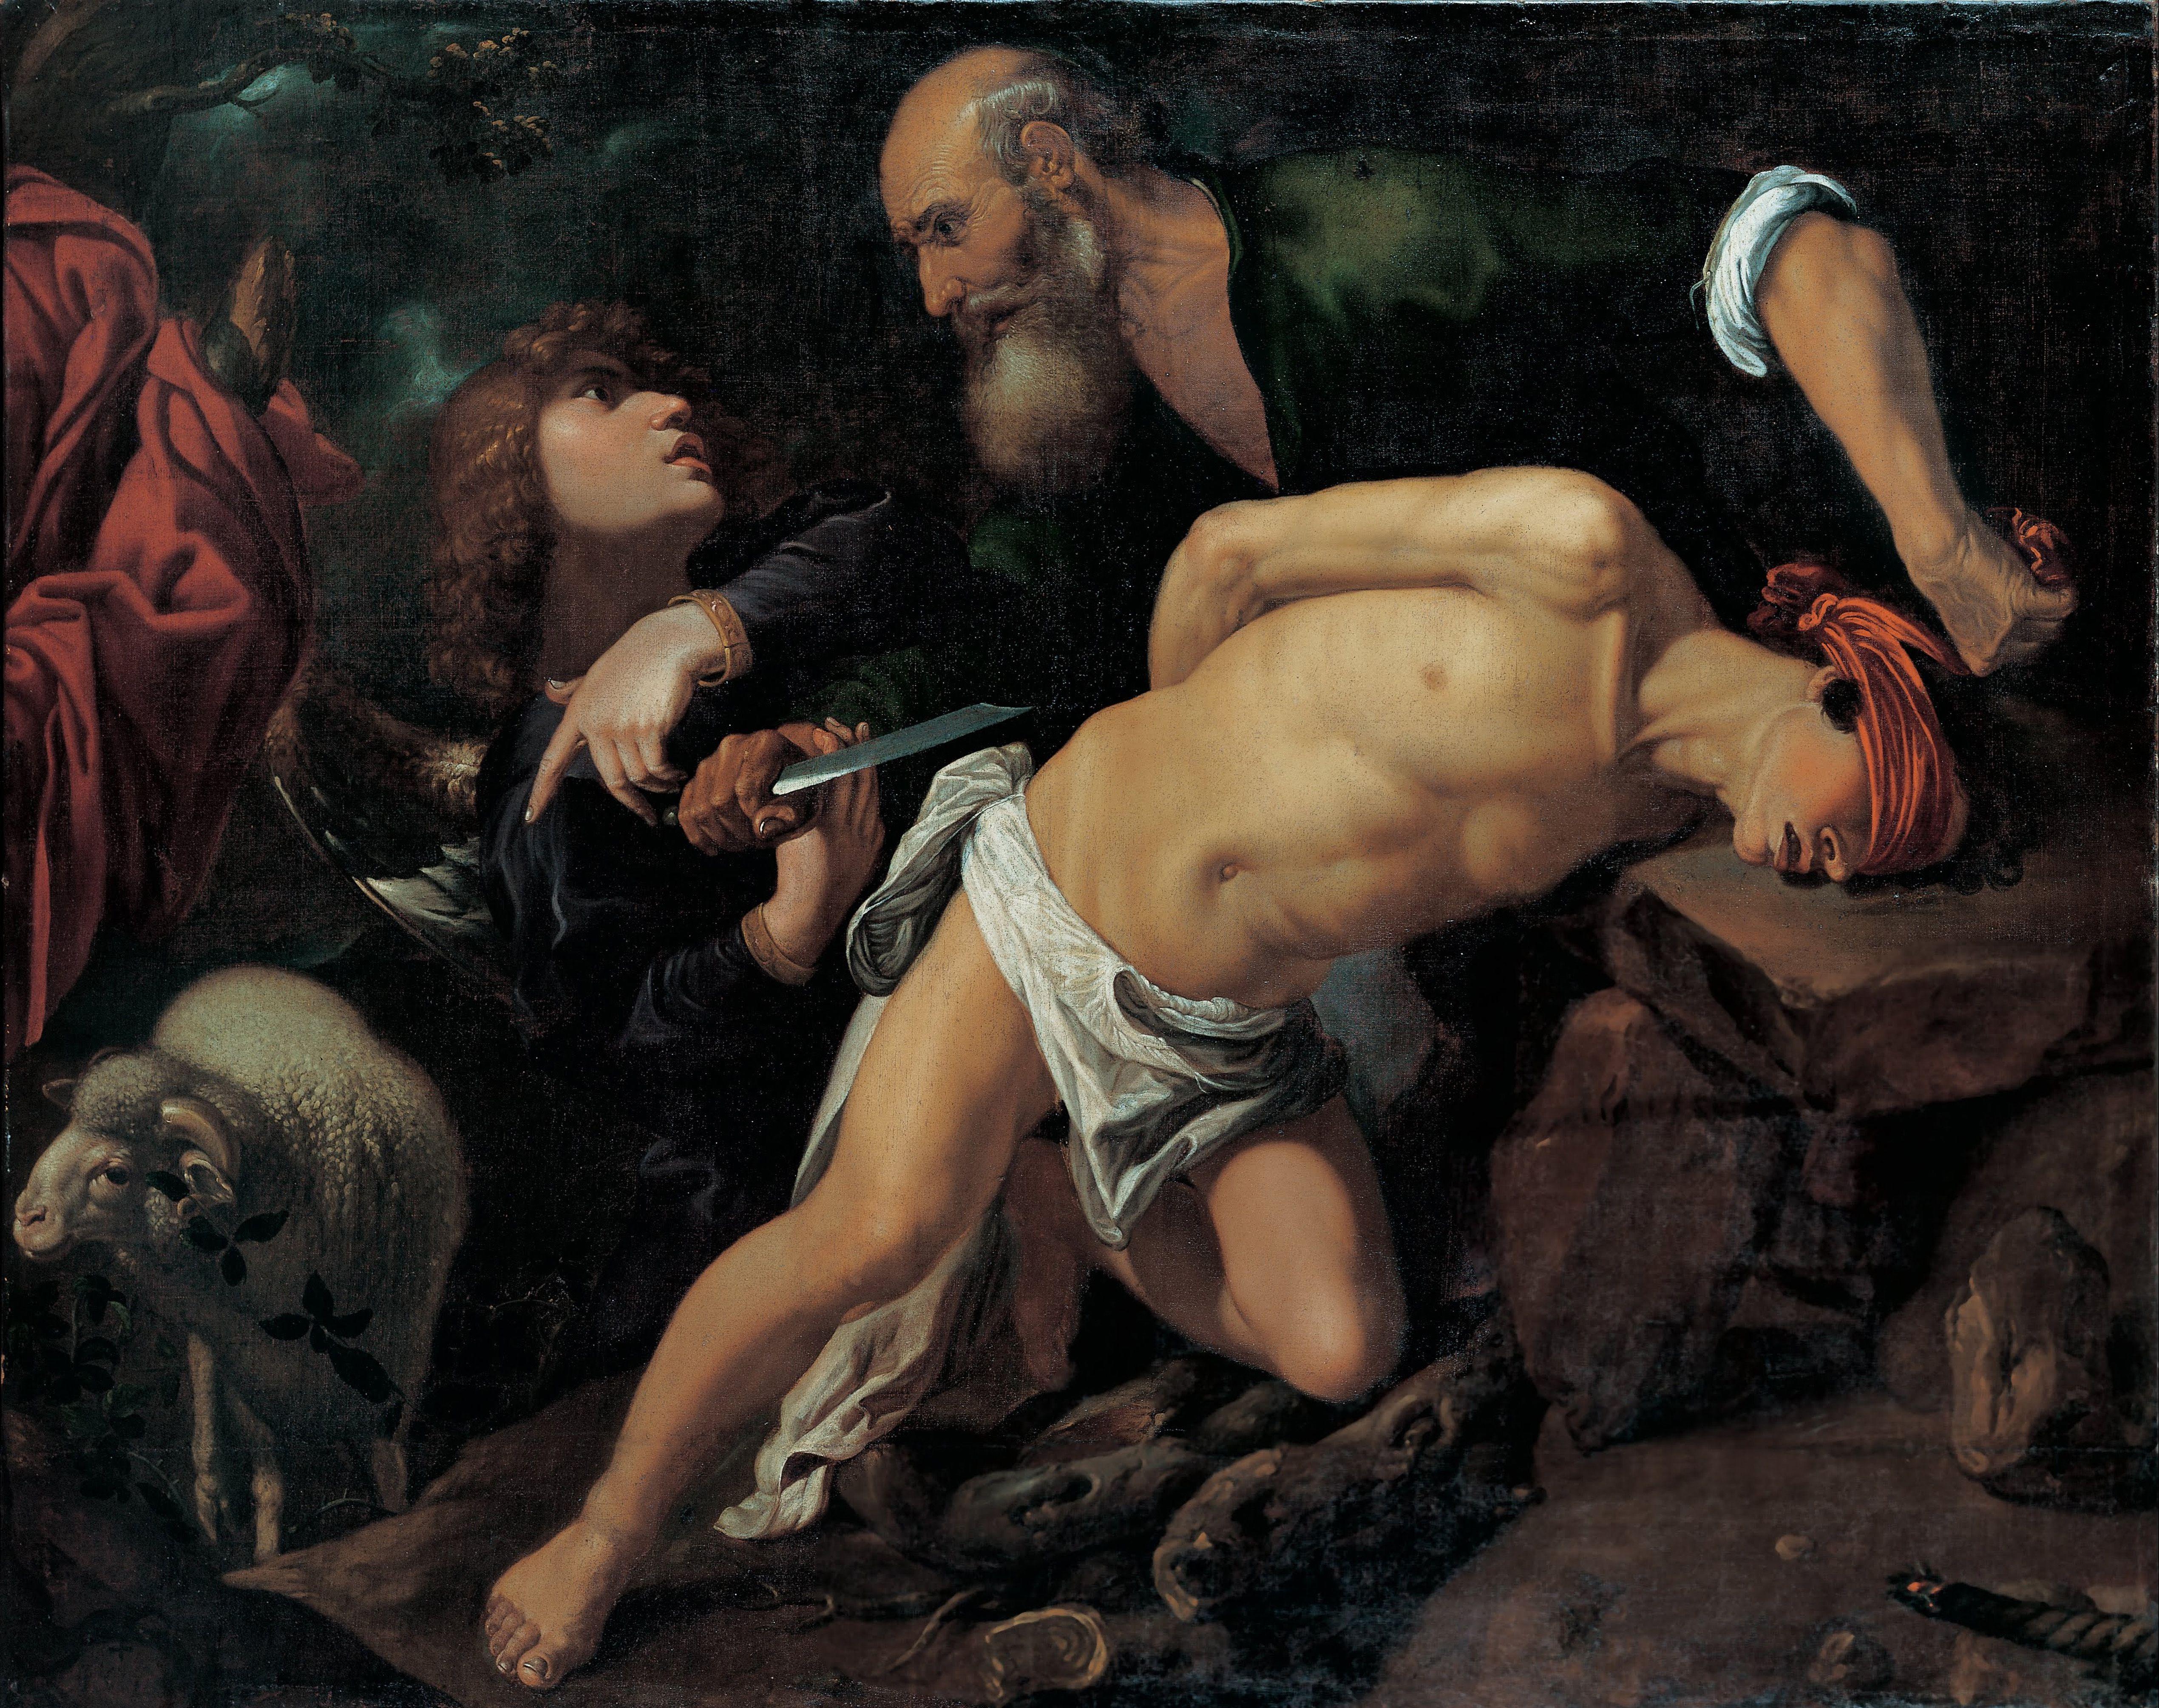 The Sacrifice of Isaac, c. 1615. Artist: Orrente, Pedro (1588-1645)